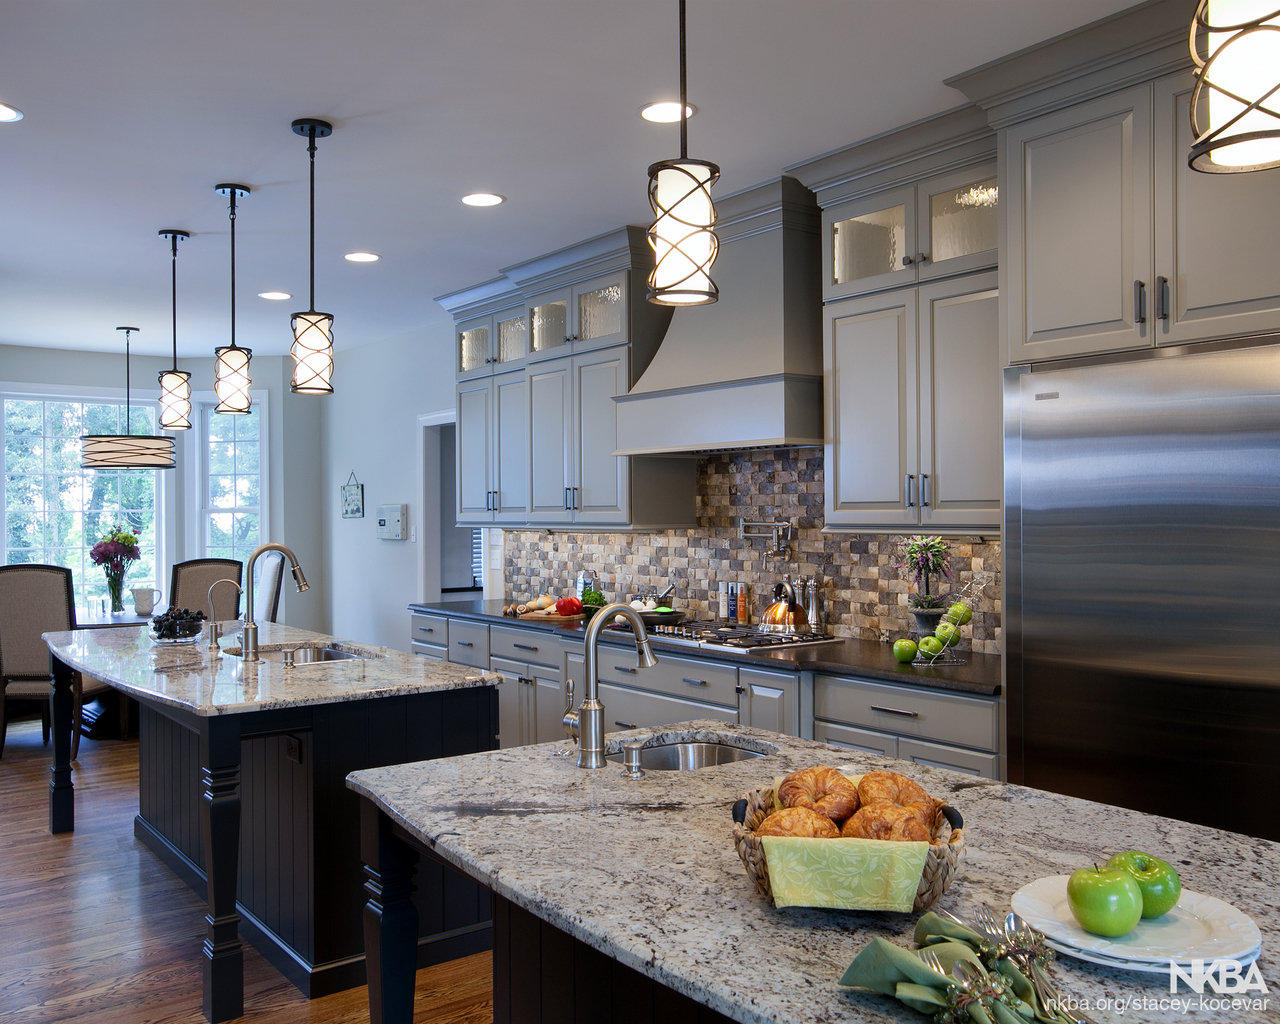 Harrisburg transitional double island kitchen transitional kitchen